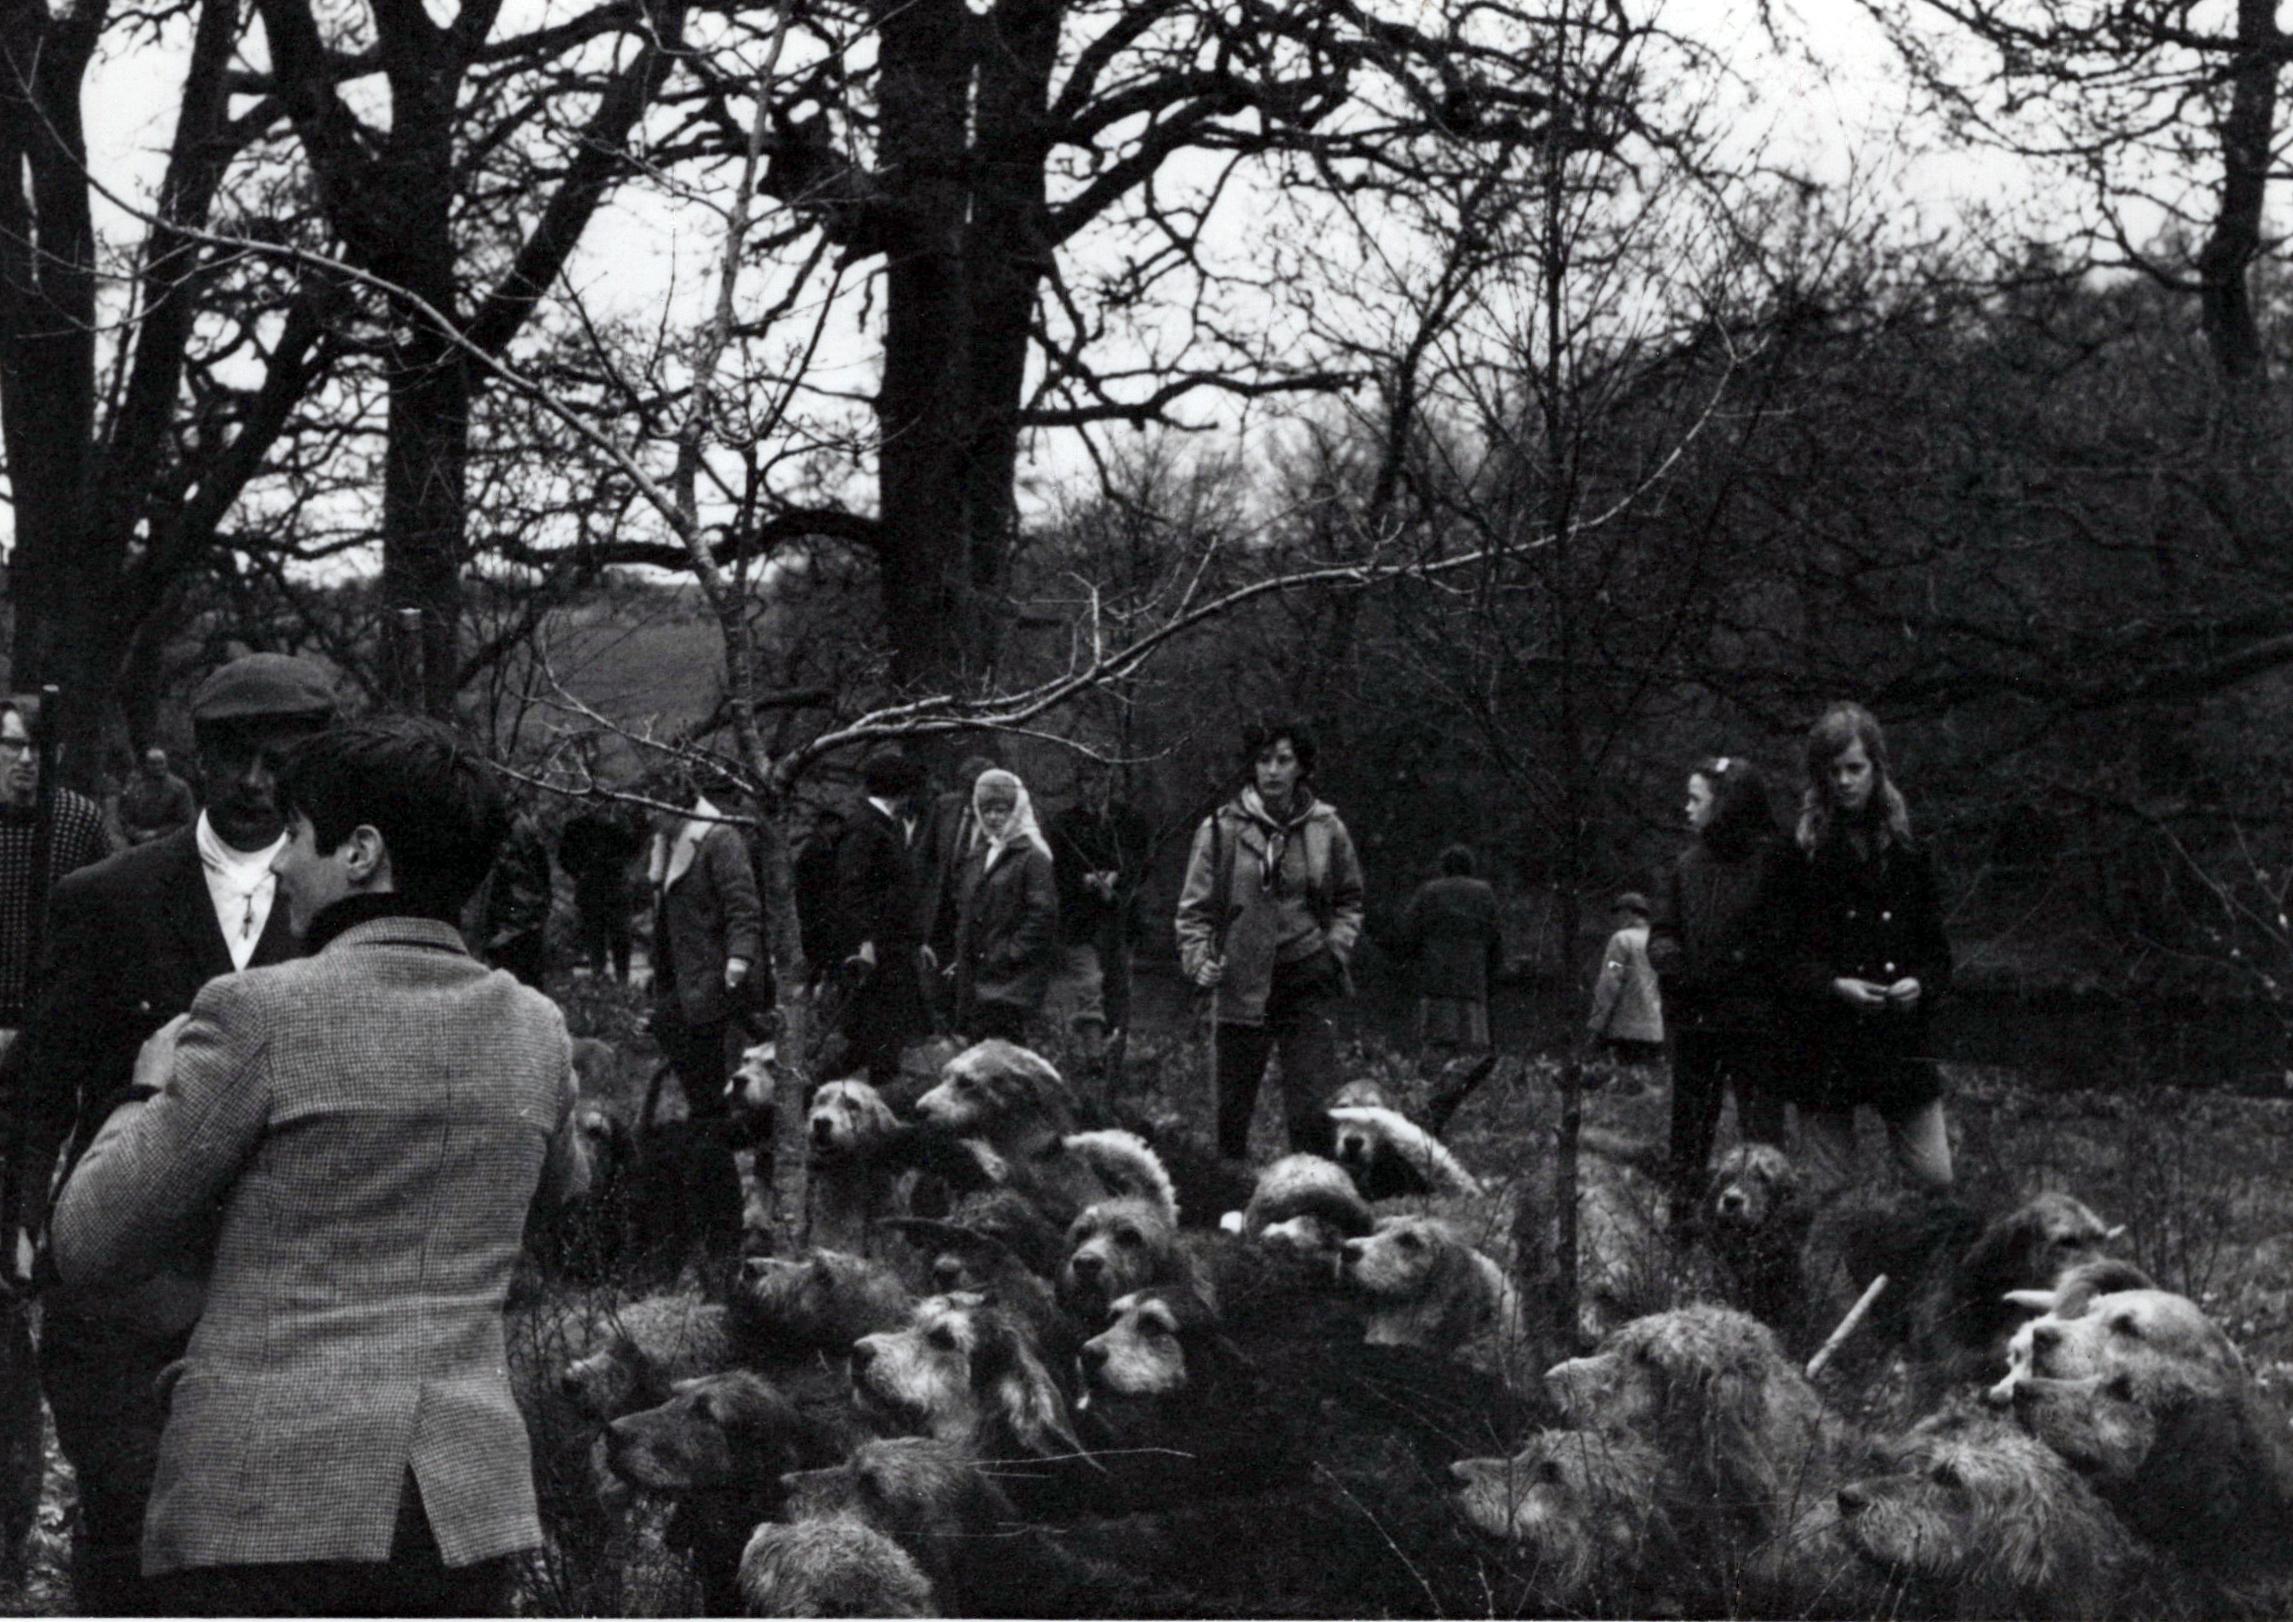 1970_Mei_Otterhound-Schotland_0005_a